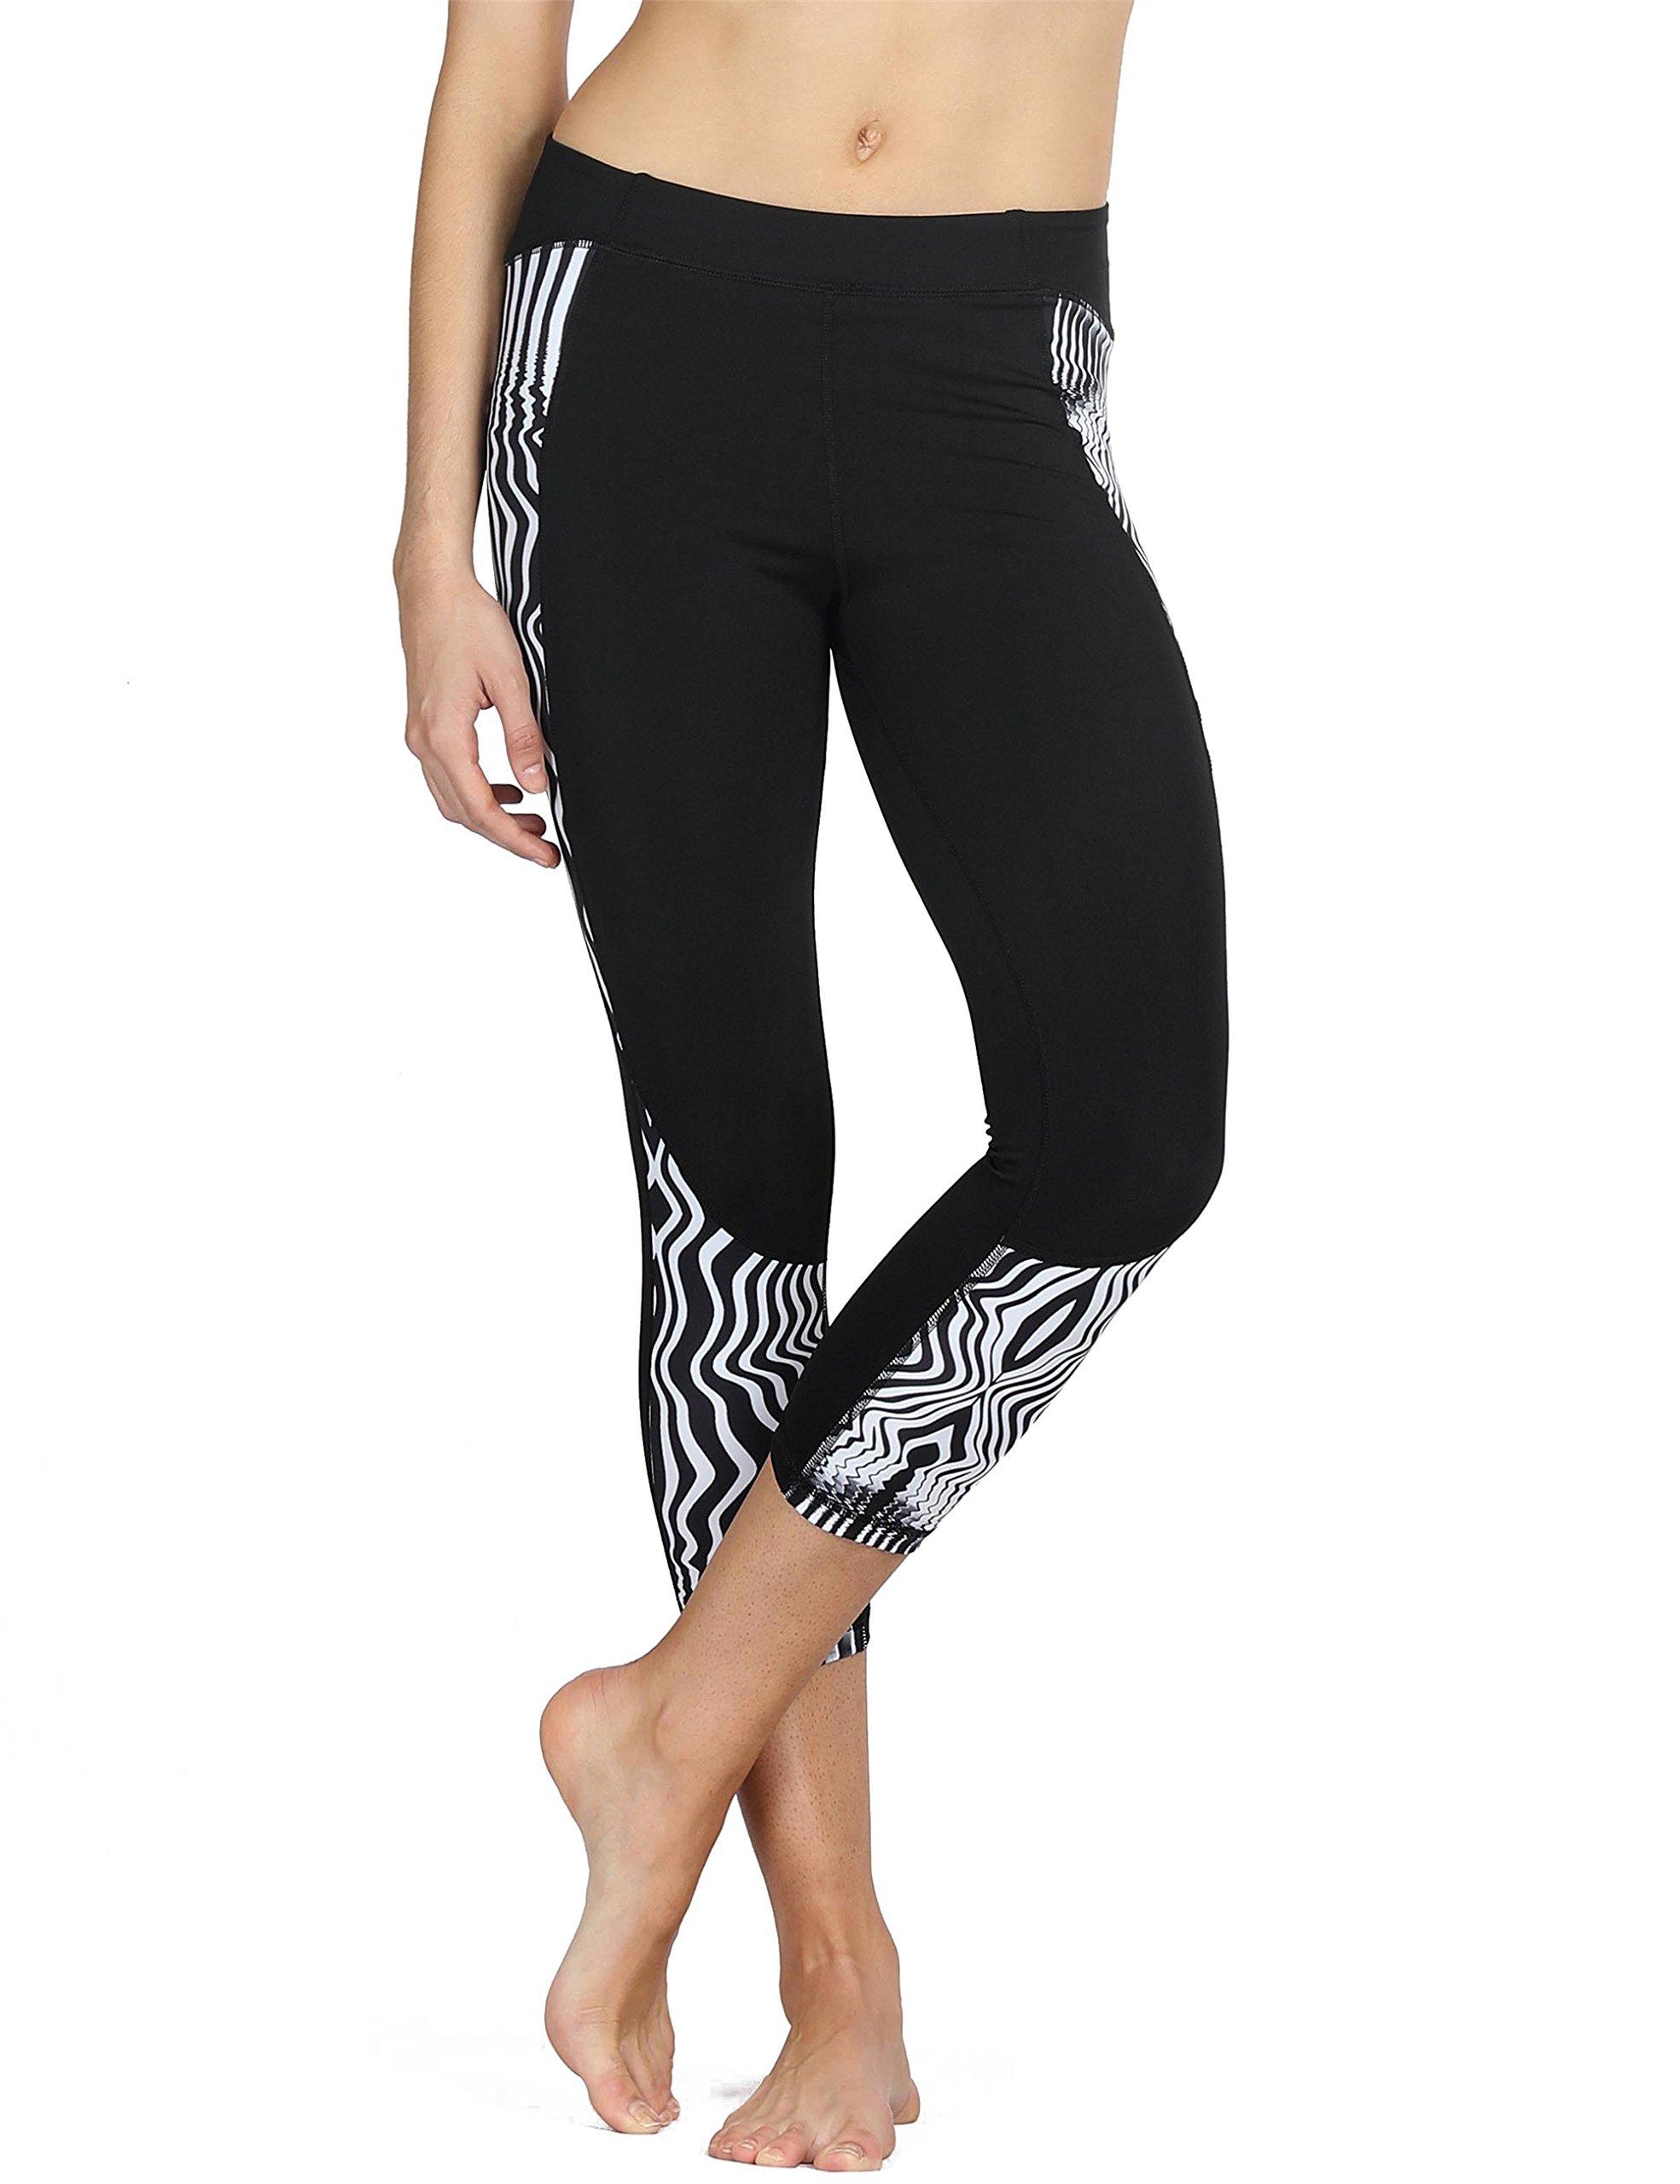 b15c0d19375f7 Galleon - Icyzone Capri Yoga Pants Athletic Leggings Workout Clothes  Fitness Tights For Women (L, Zebra-Stripe)